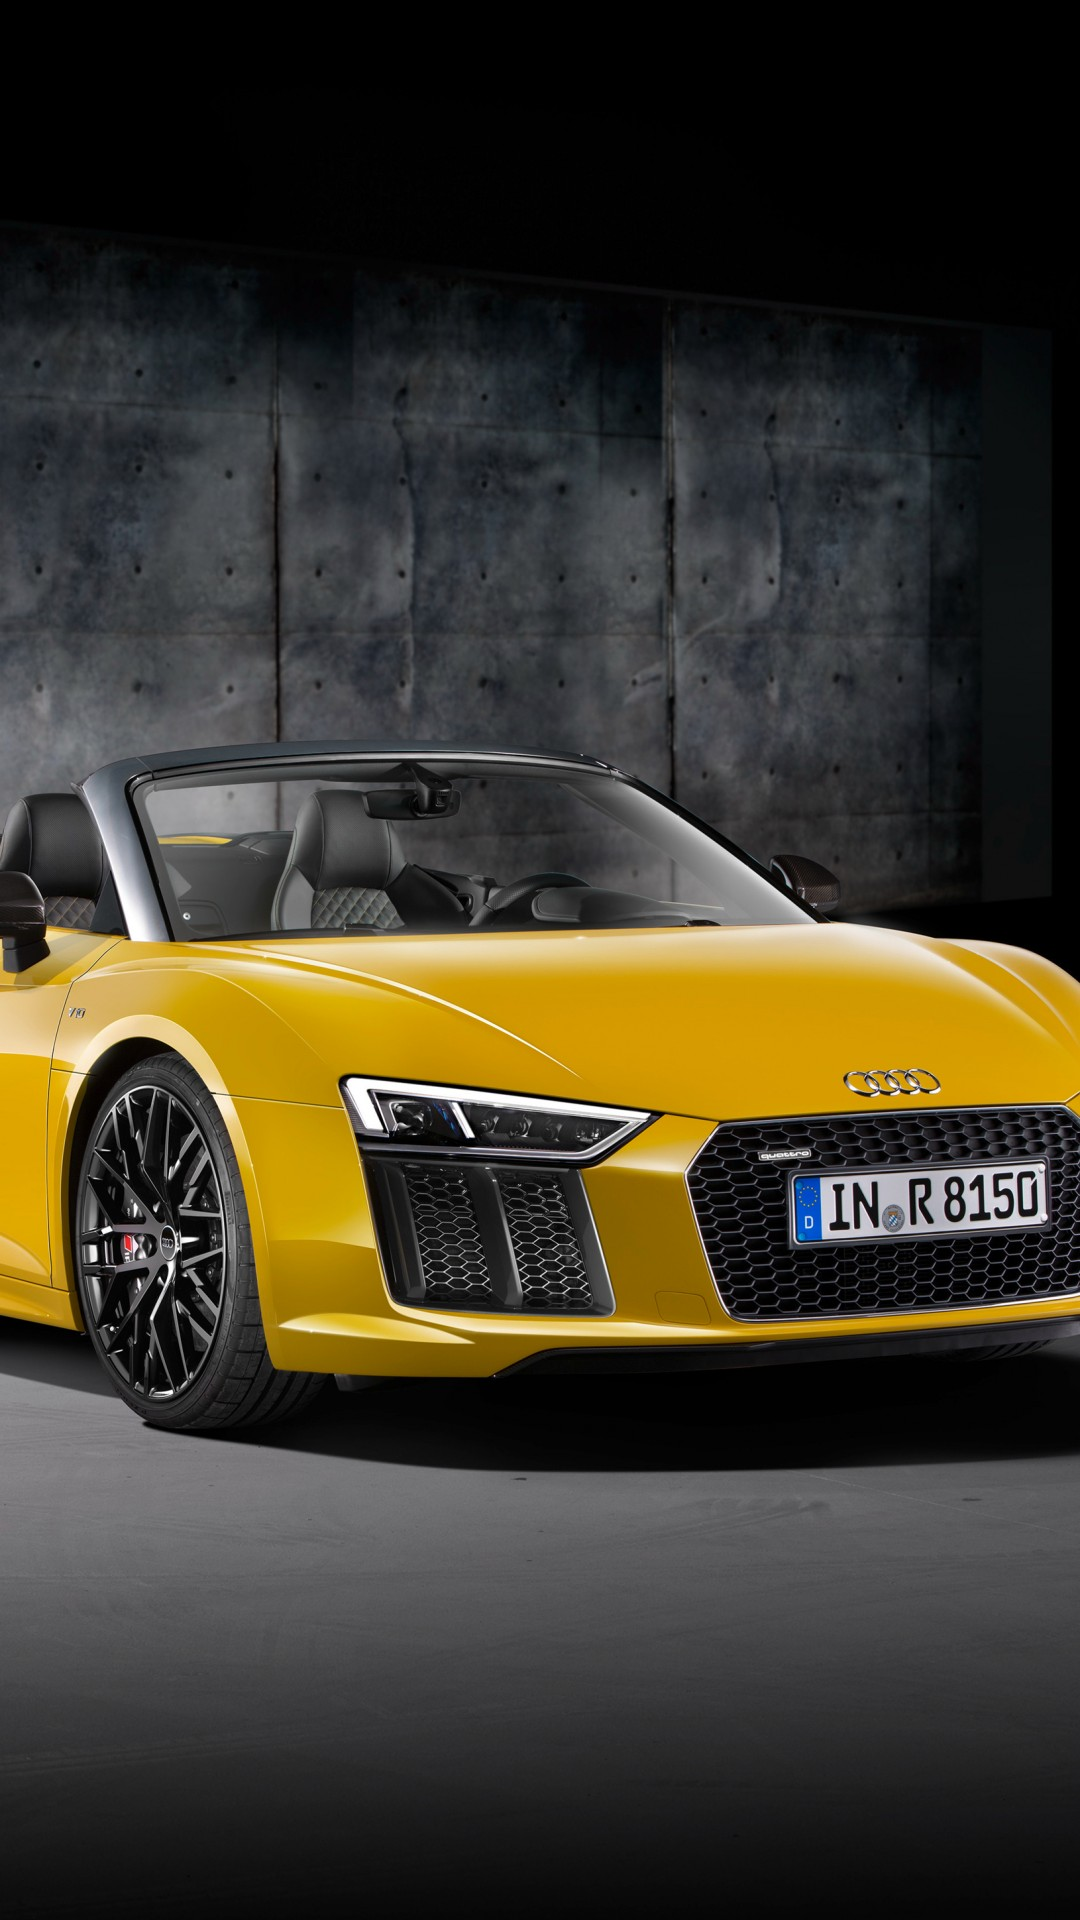 Wallpaper Audi R8 Nyias 2016 Supercar Yellow Cars